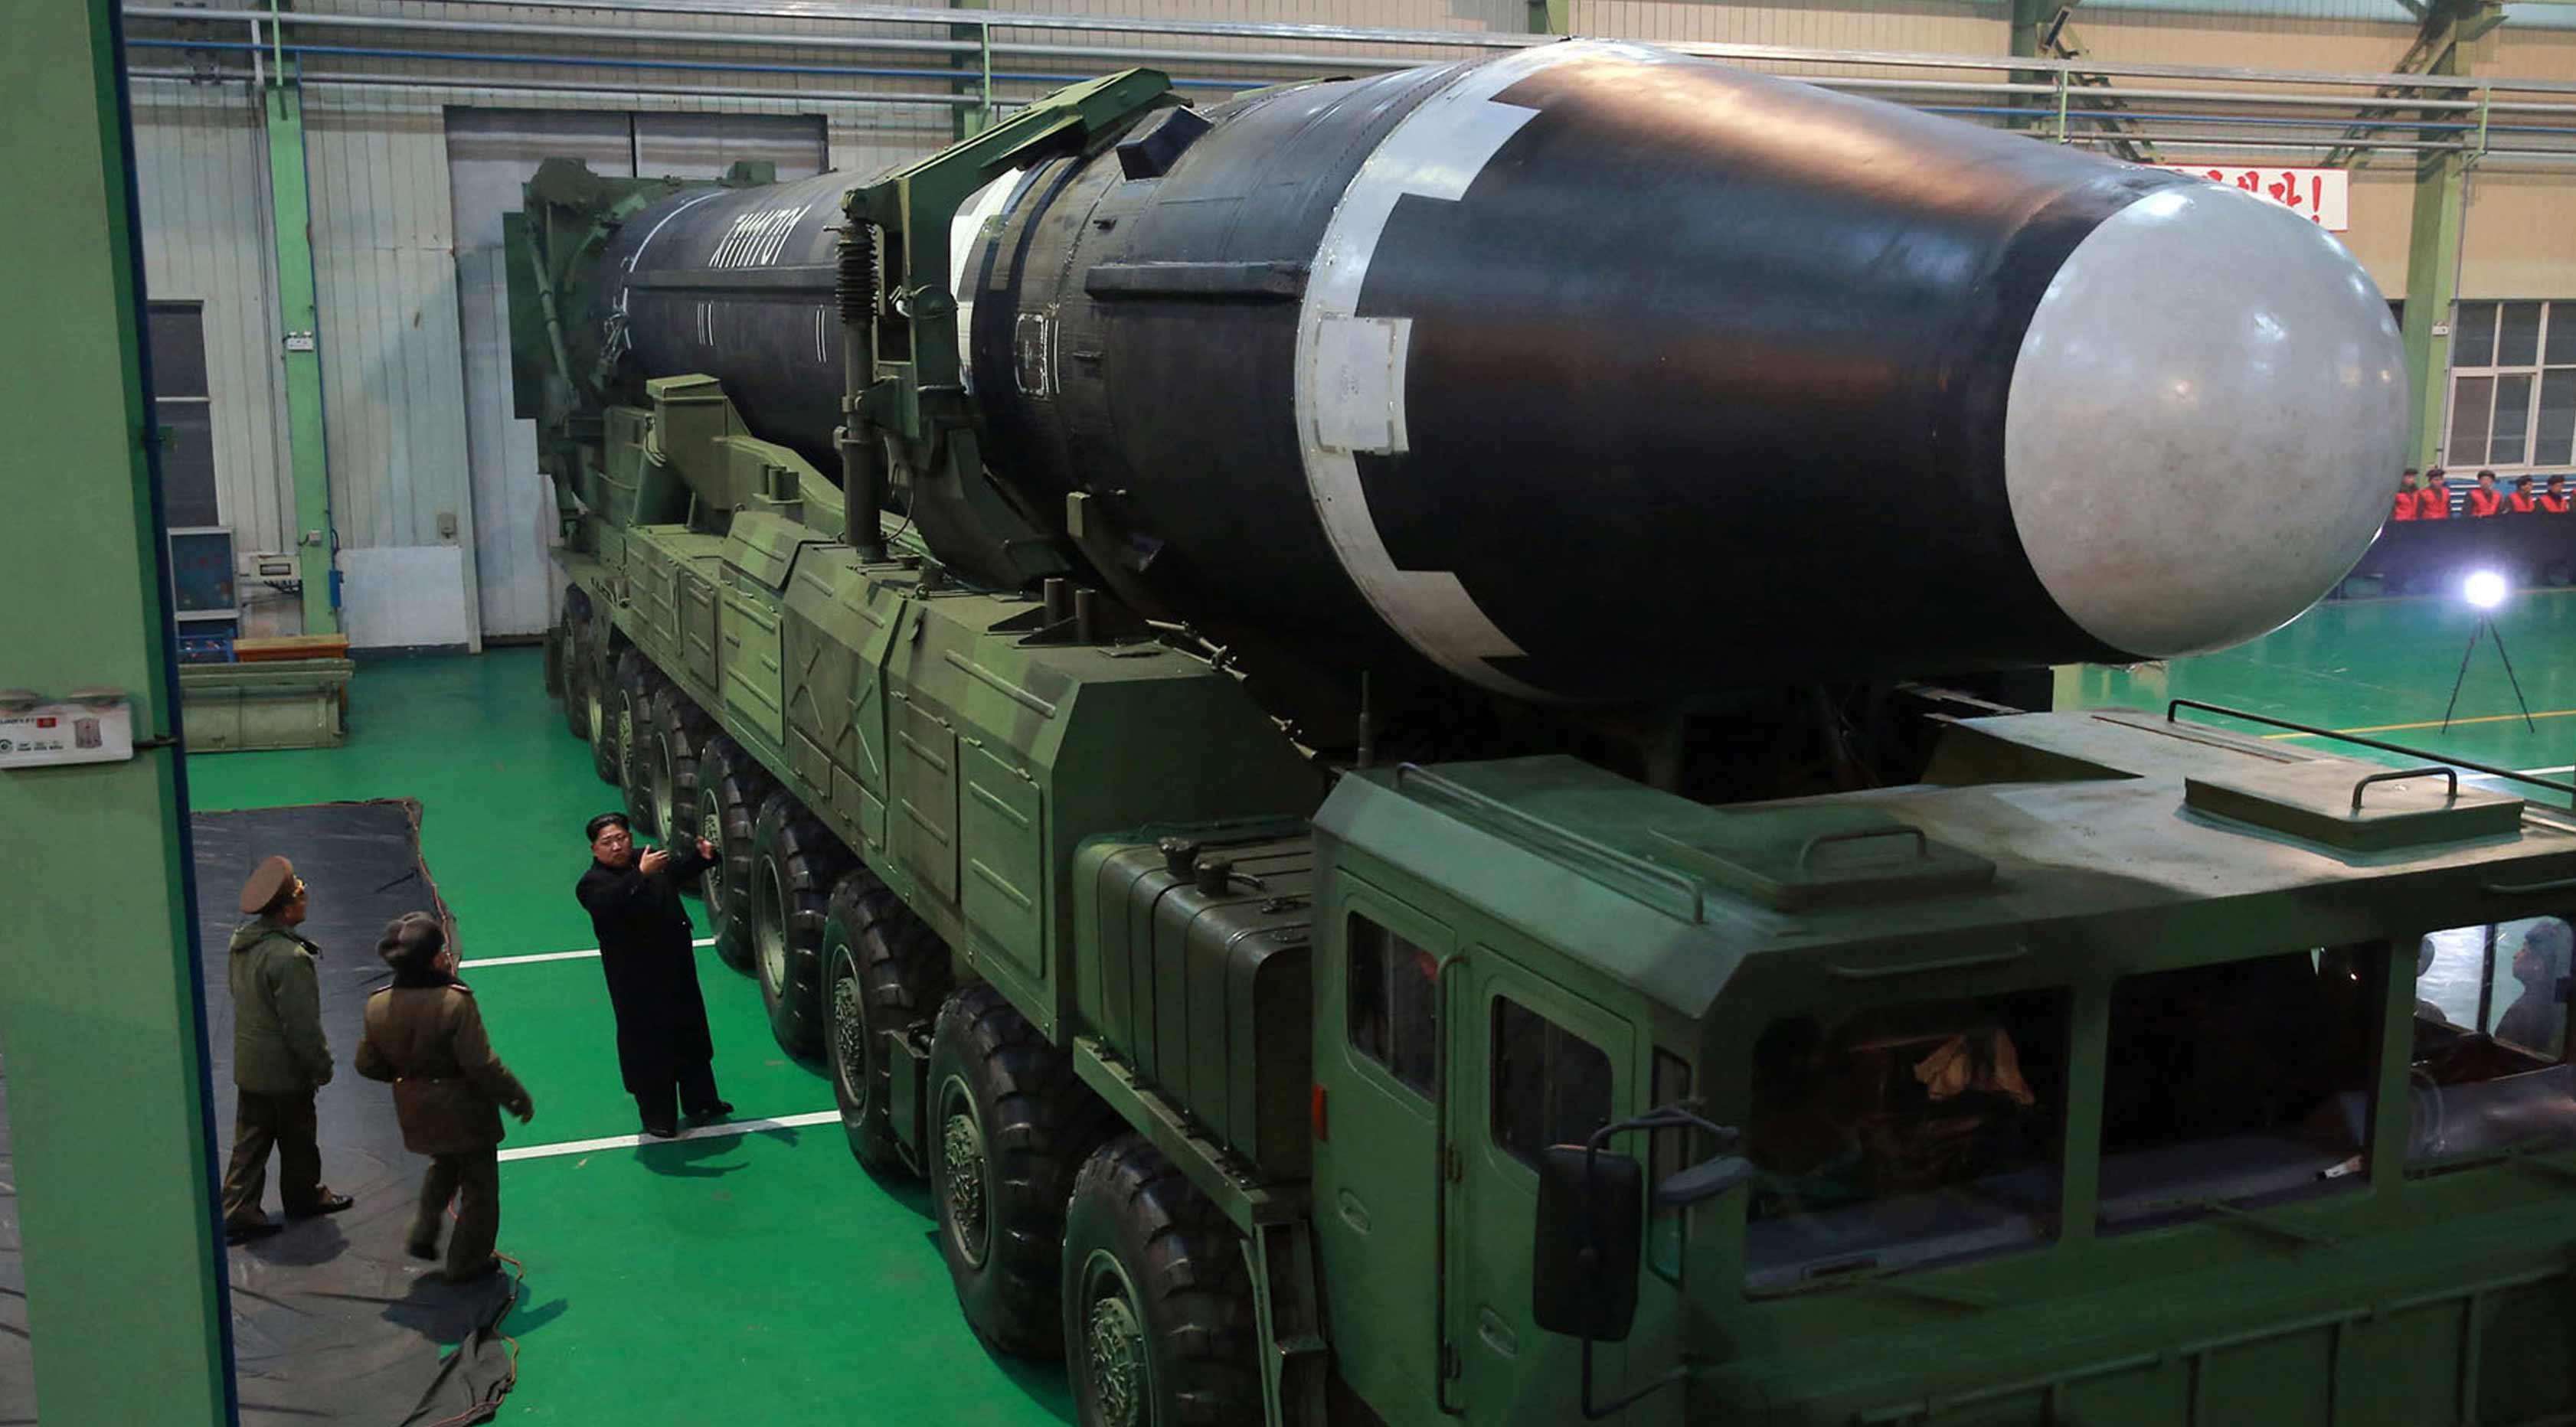 Pemimpin Korea Utara Kim Jong Un (ketiga kiri) memeriksa Rudal Hwasong-15 versi terbaru dari Hwasong-14, yang pernah diuji coba Juli lalu. (KCNA/Korea News Service via AP)